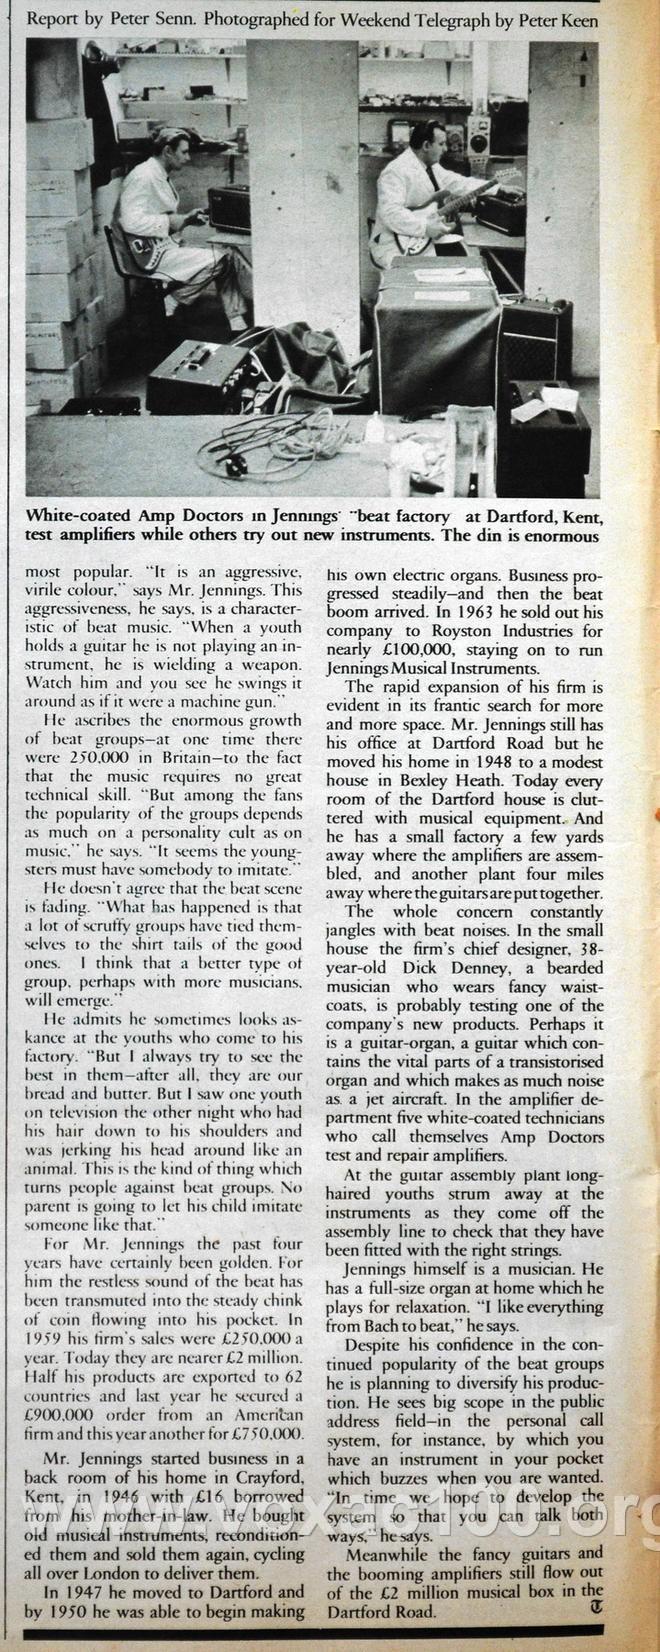 Telegraph magazine, 14th May, 1965